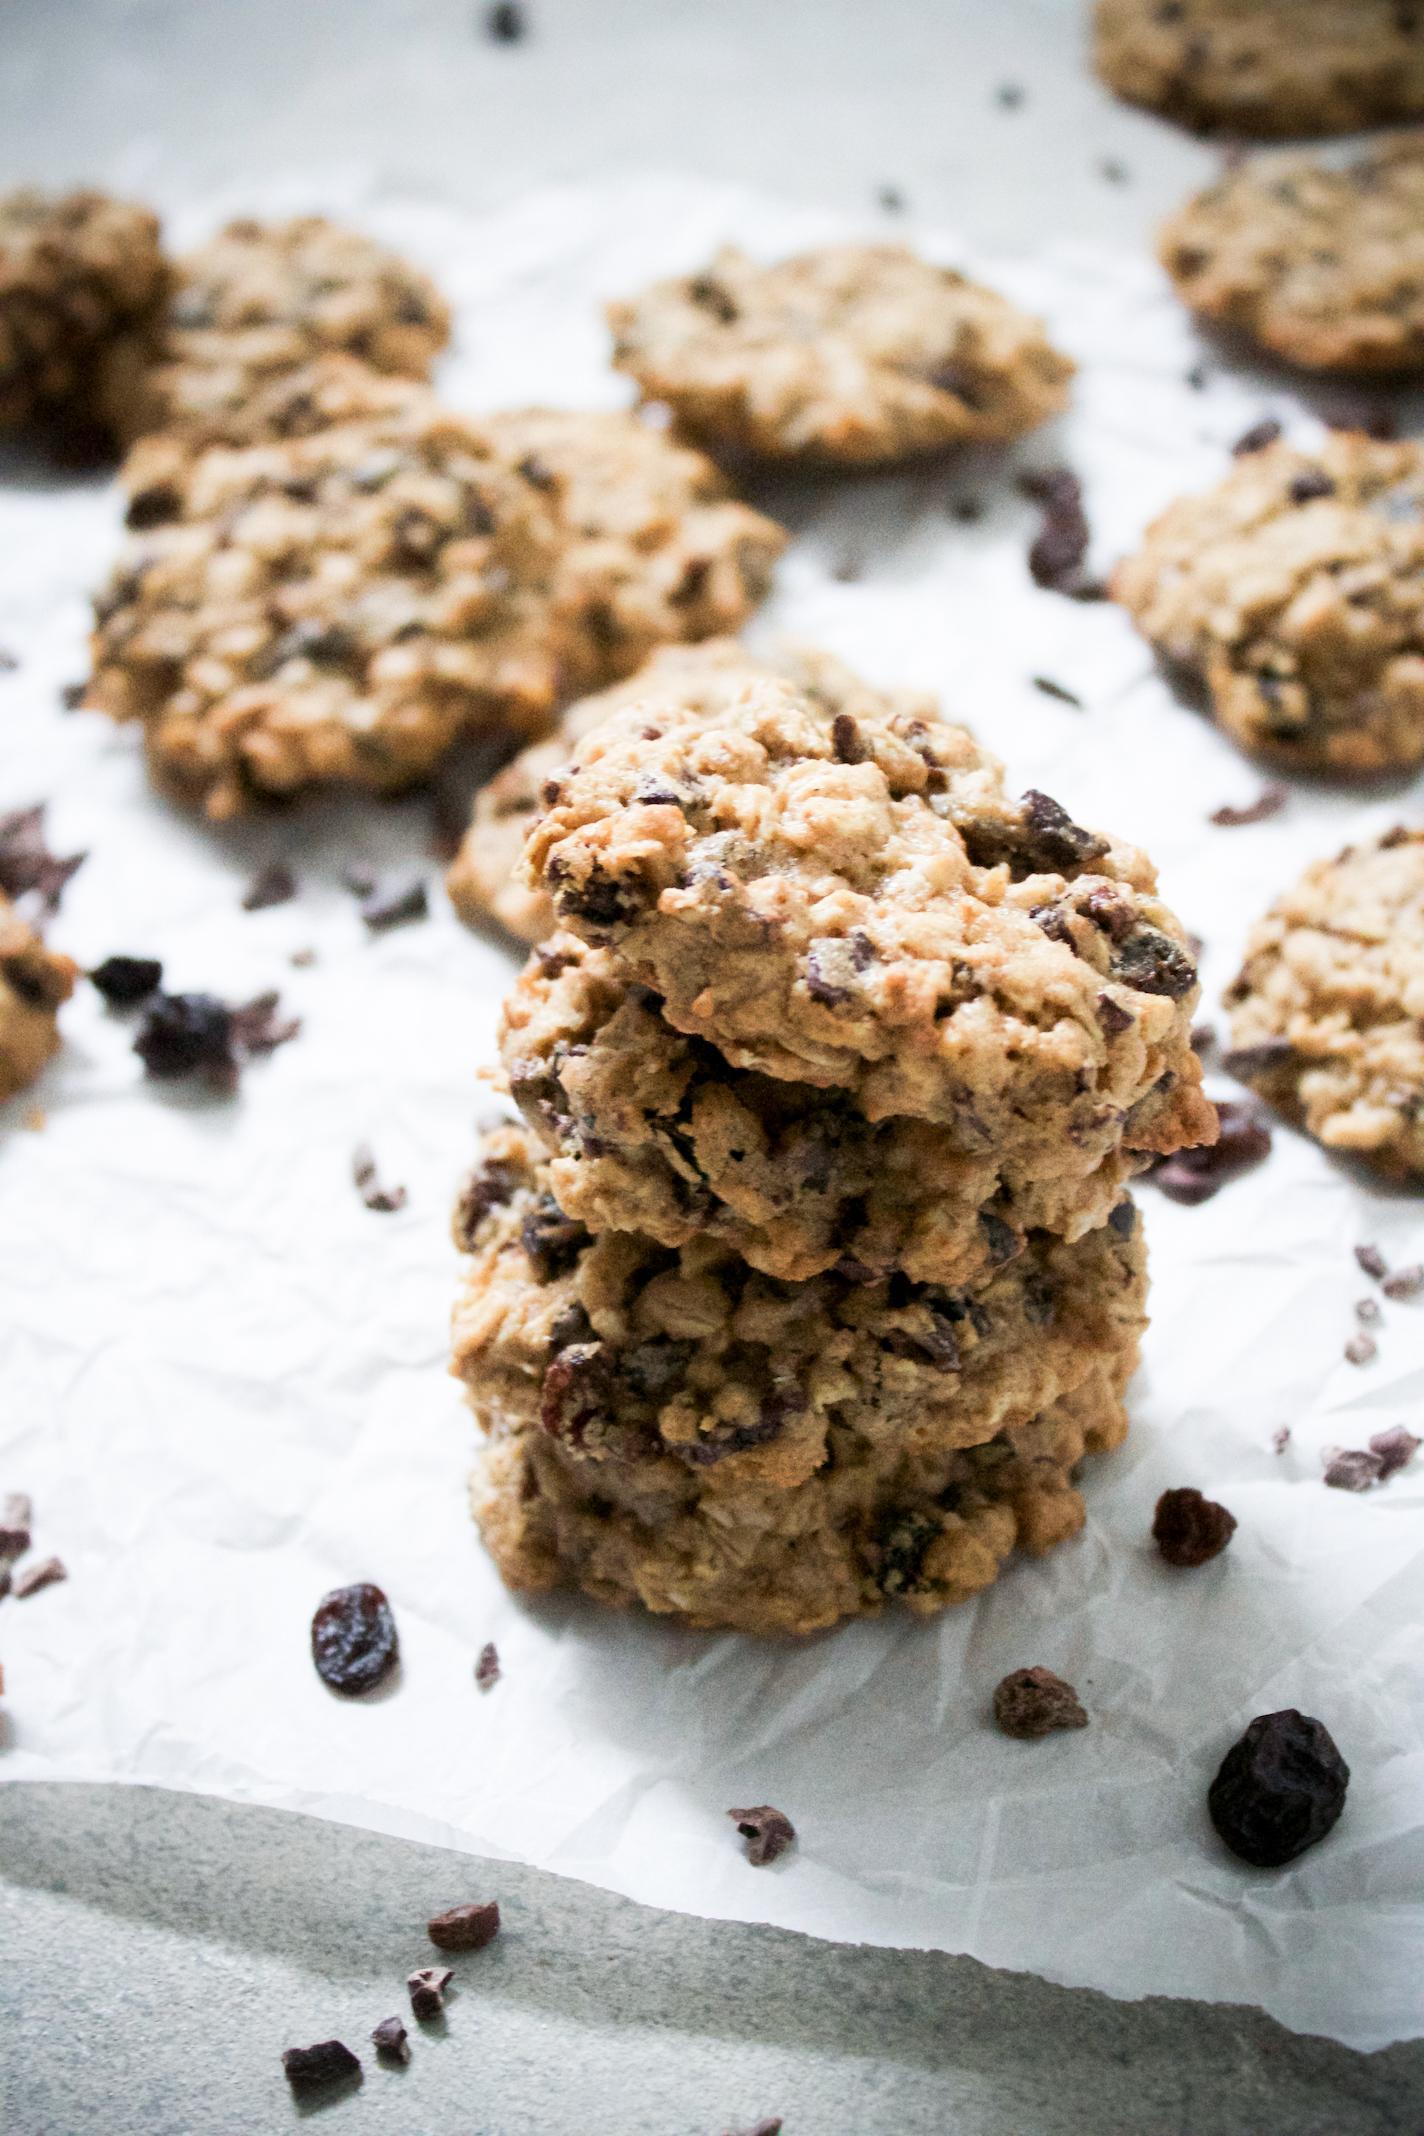 Oatmeal raisin cacao nib cookies 6.jpg